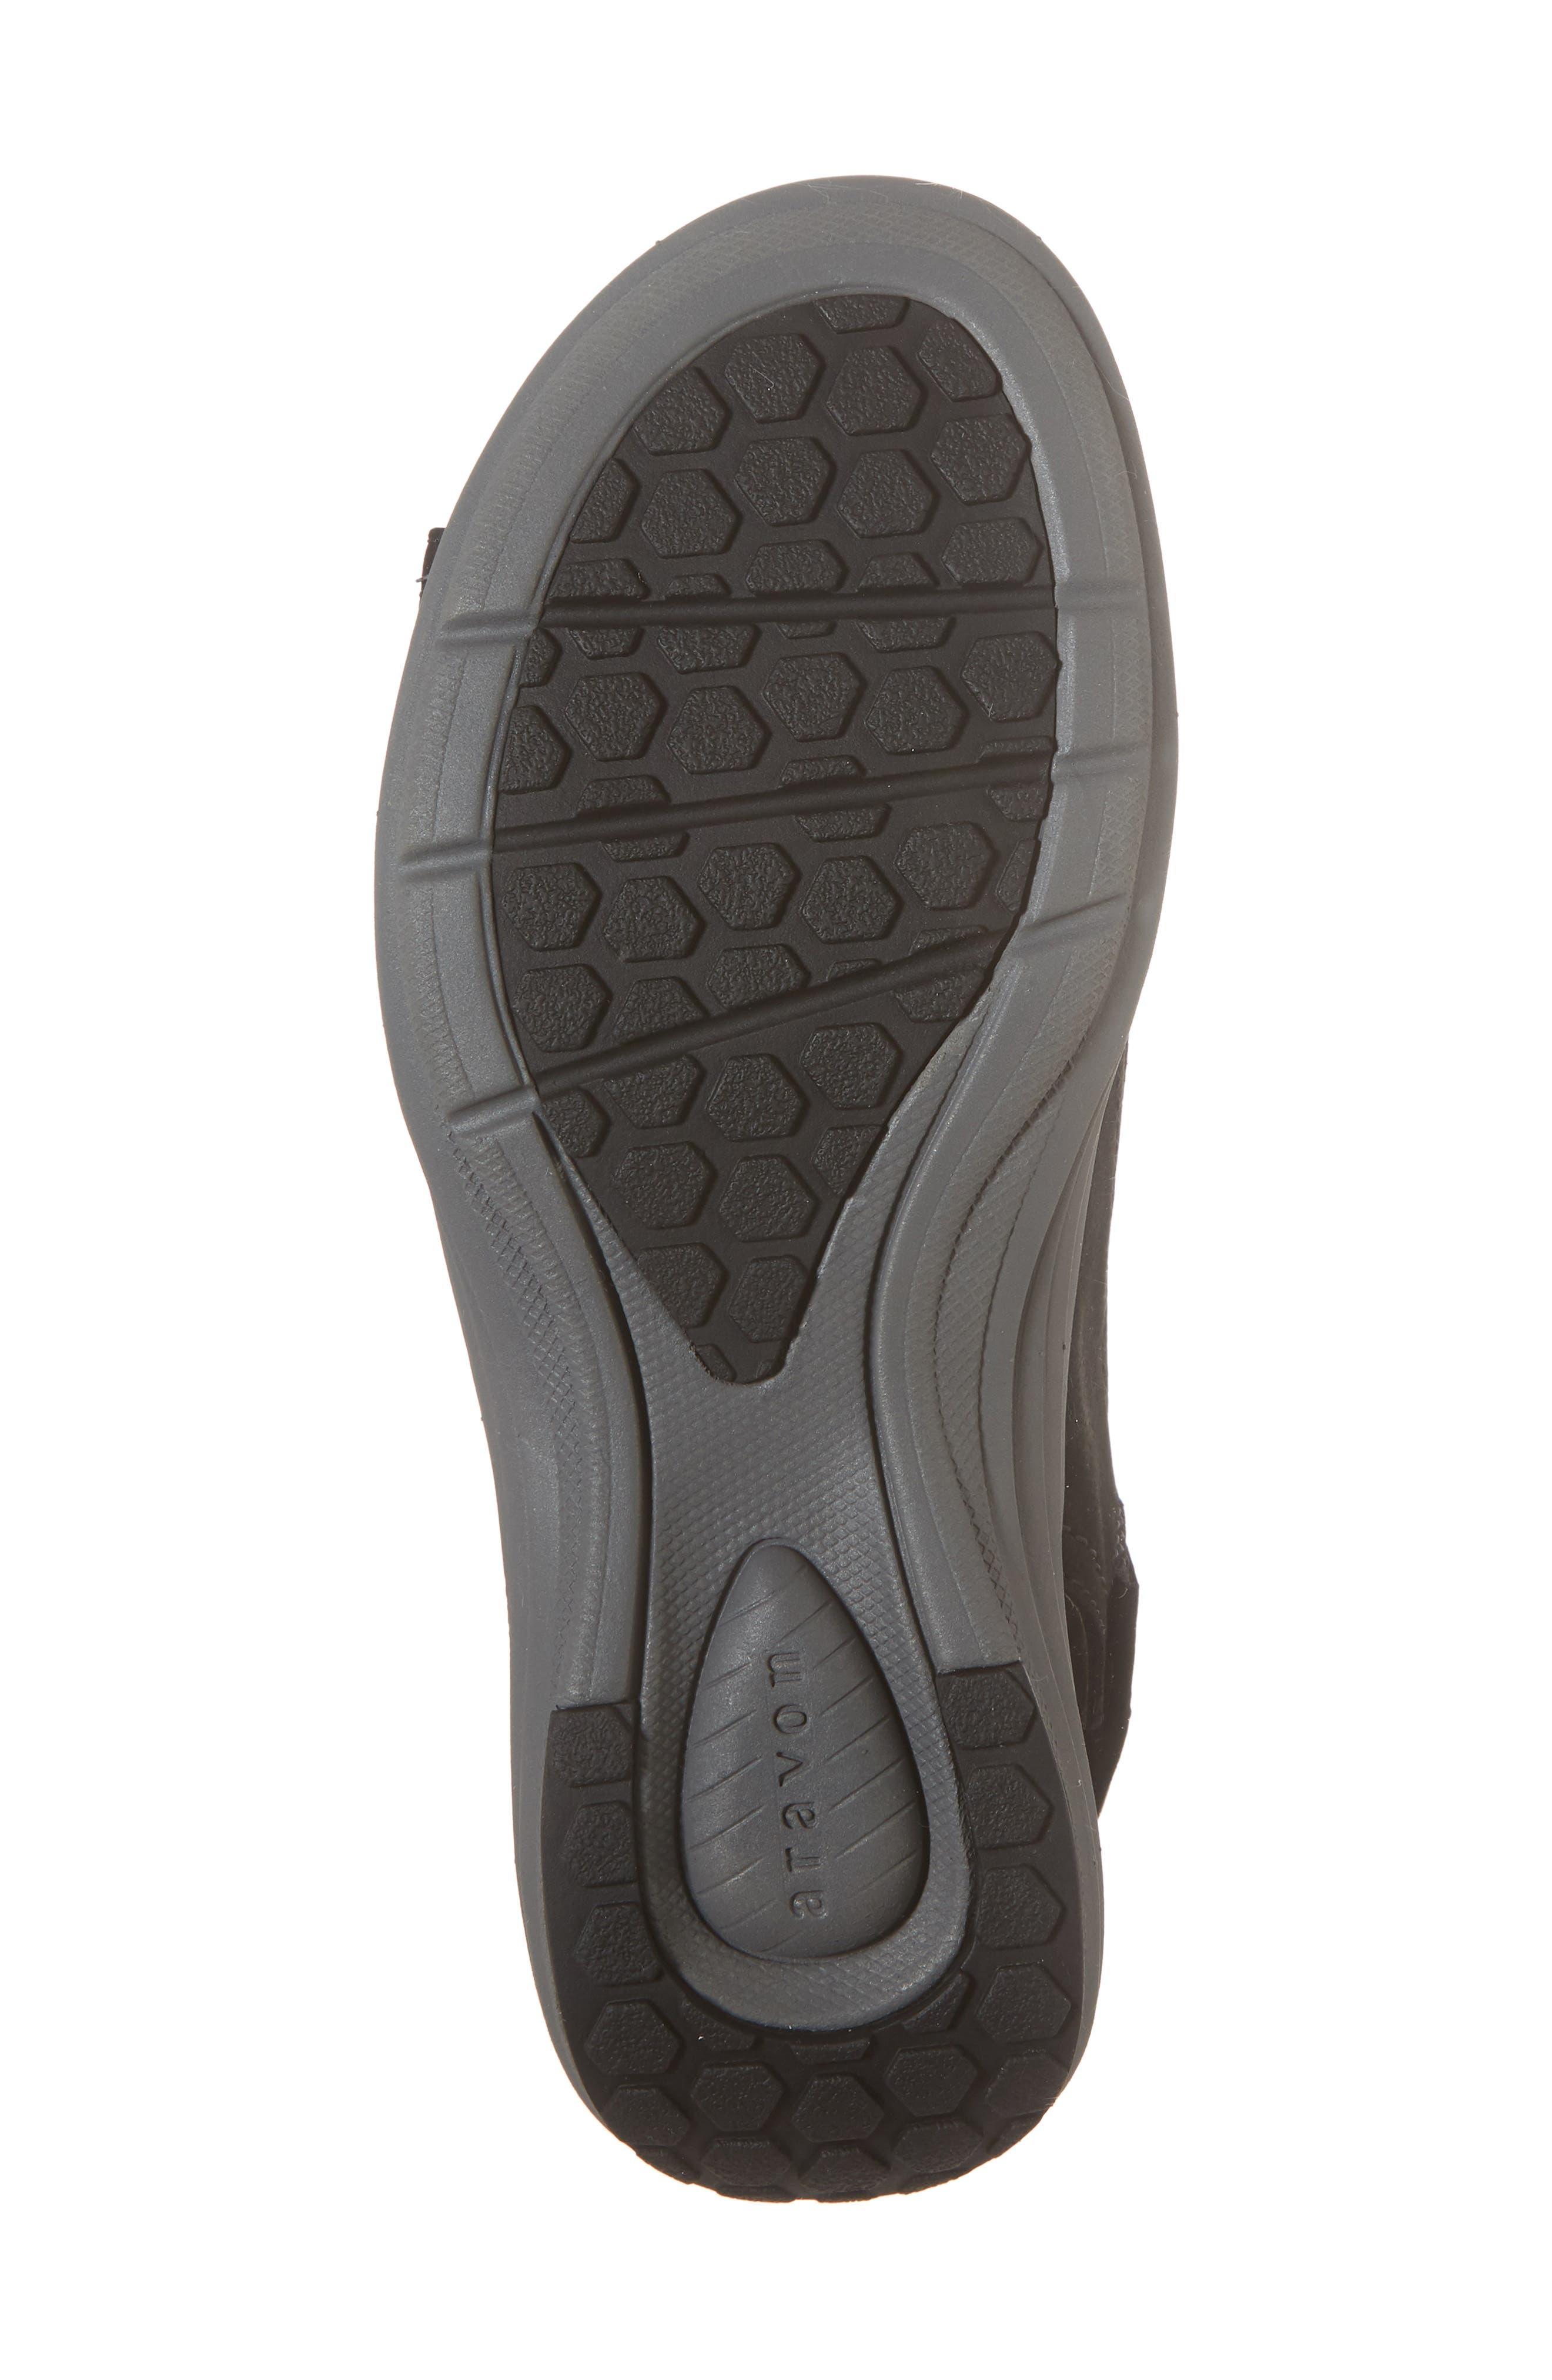 Beaumont Slingback Sandal,                             Alternate thumbnail 6, color,                             Black Nubuck Leather